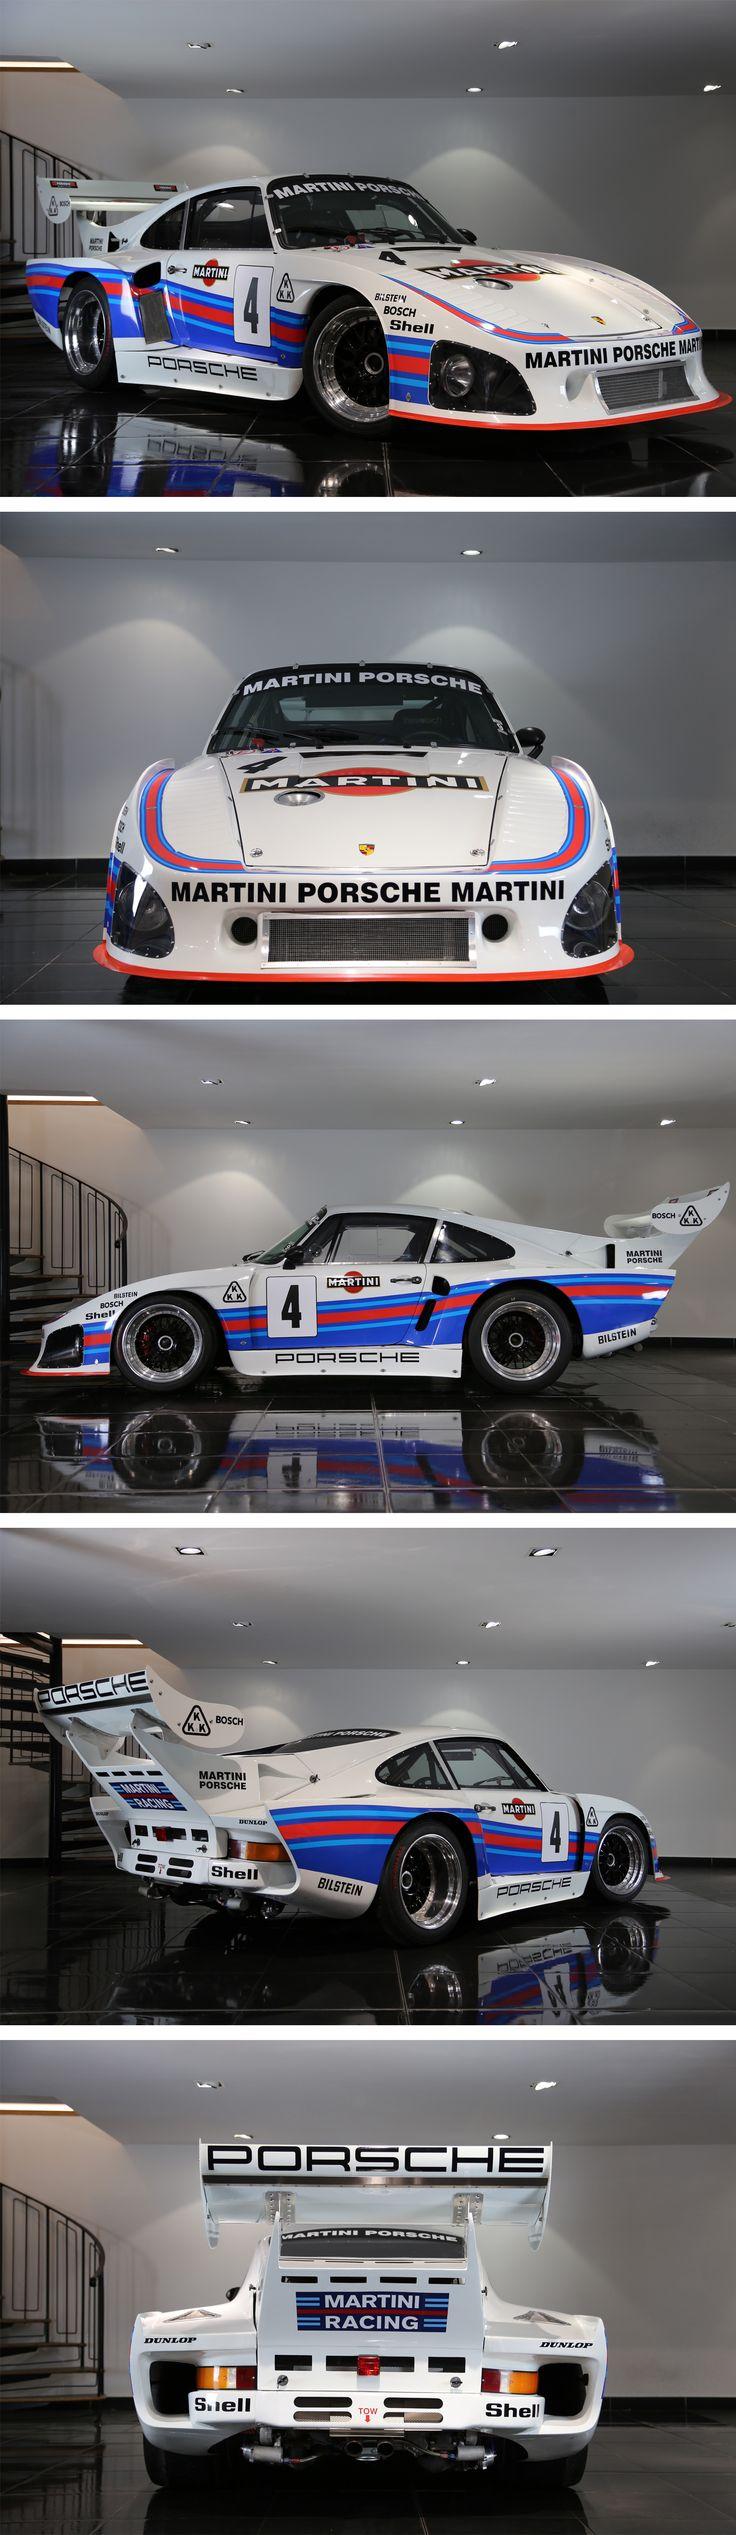 Porsche 935 K3 LeMans LM24 935 Martini